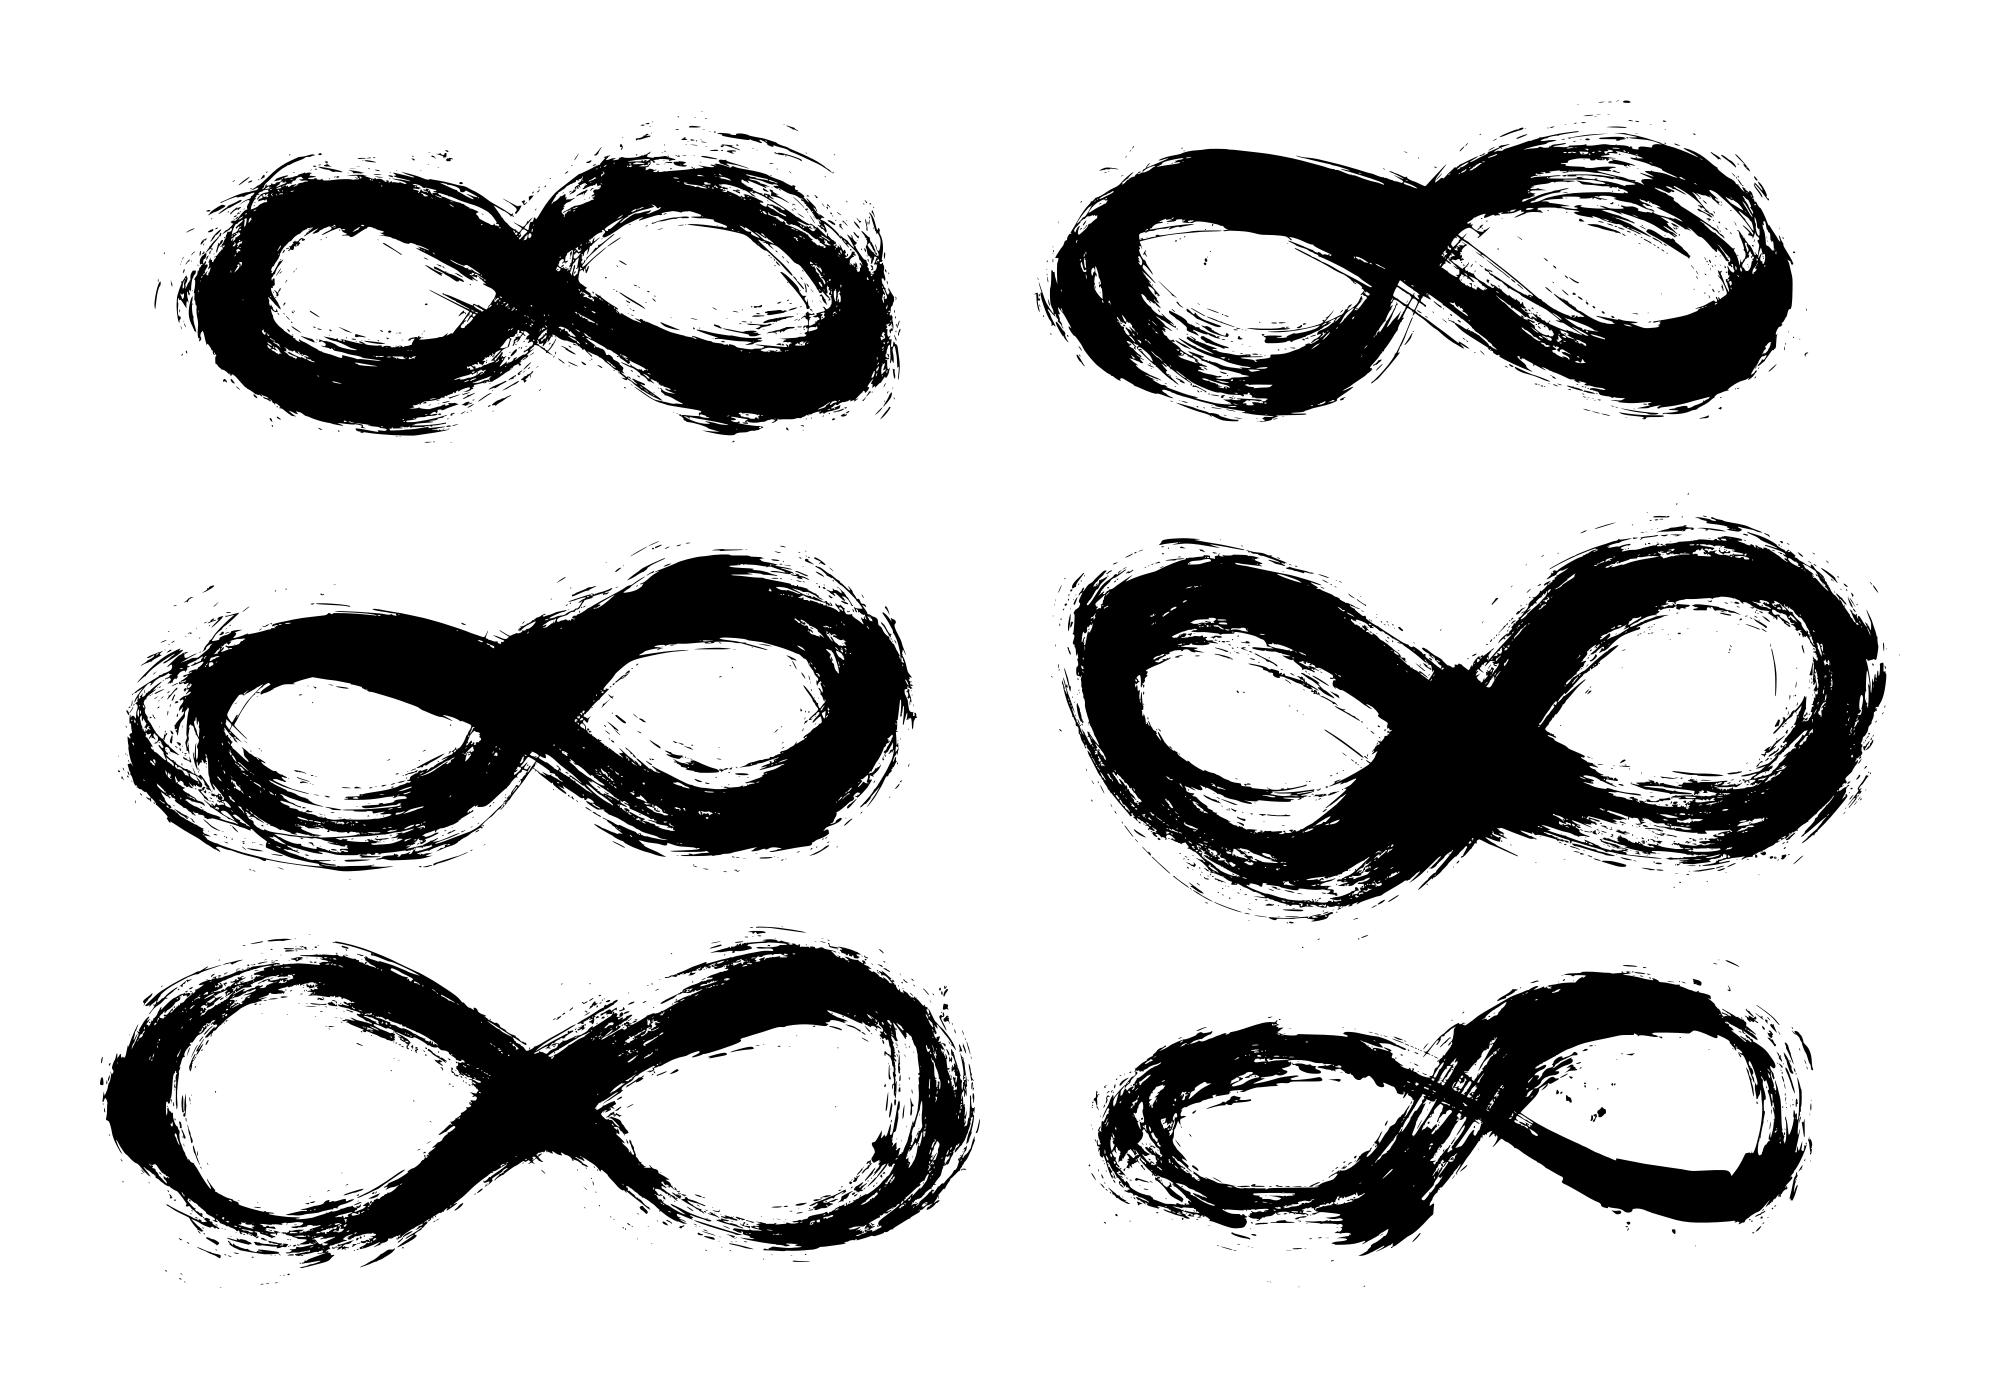 6 grunge infinity symbol png transparent onlygfx 6 grunge infinity symbol png transparent biocorpaavc